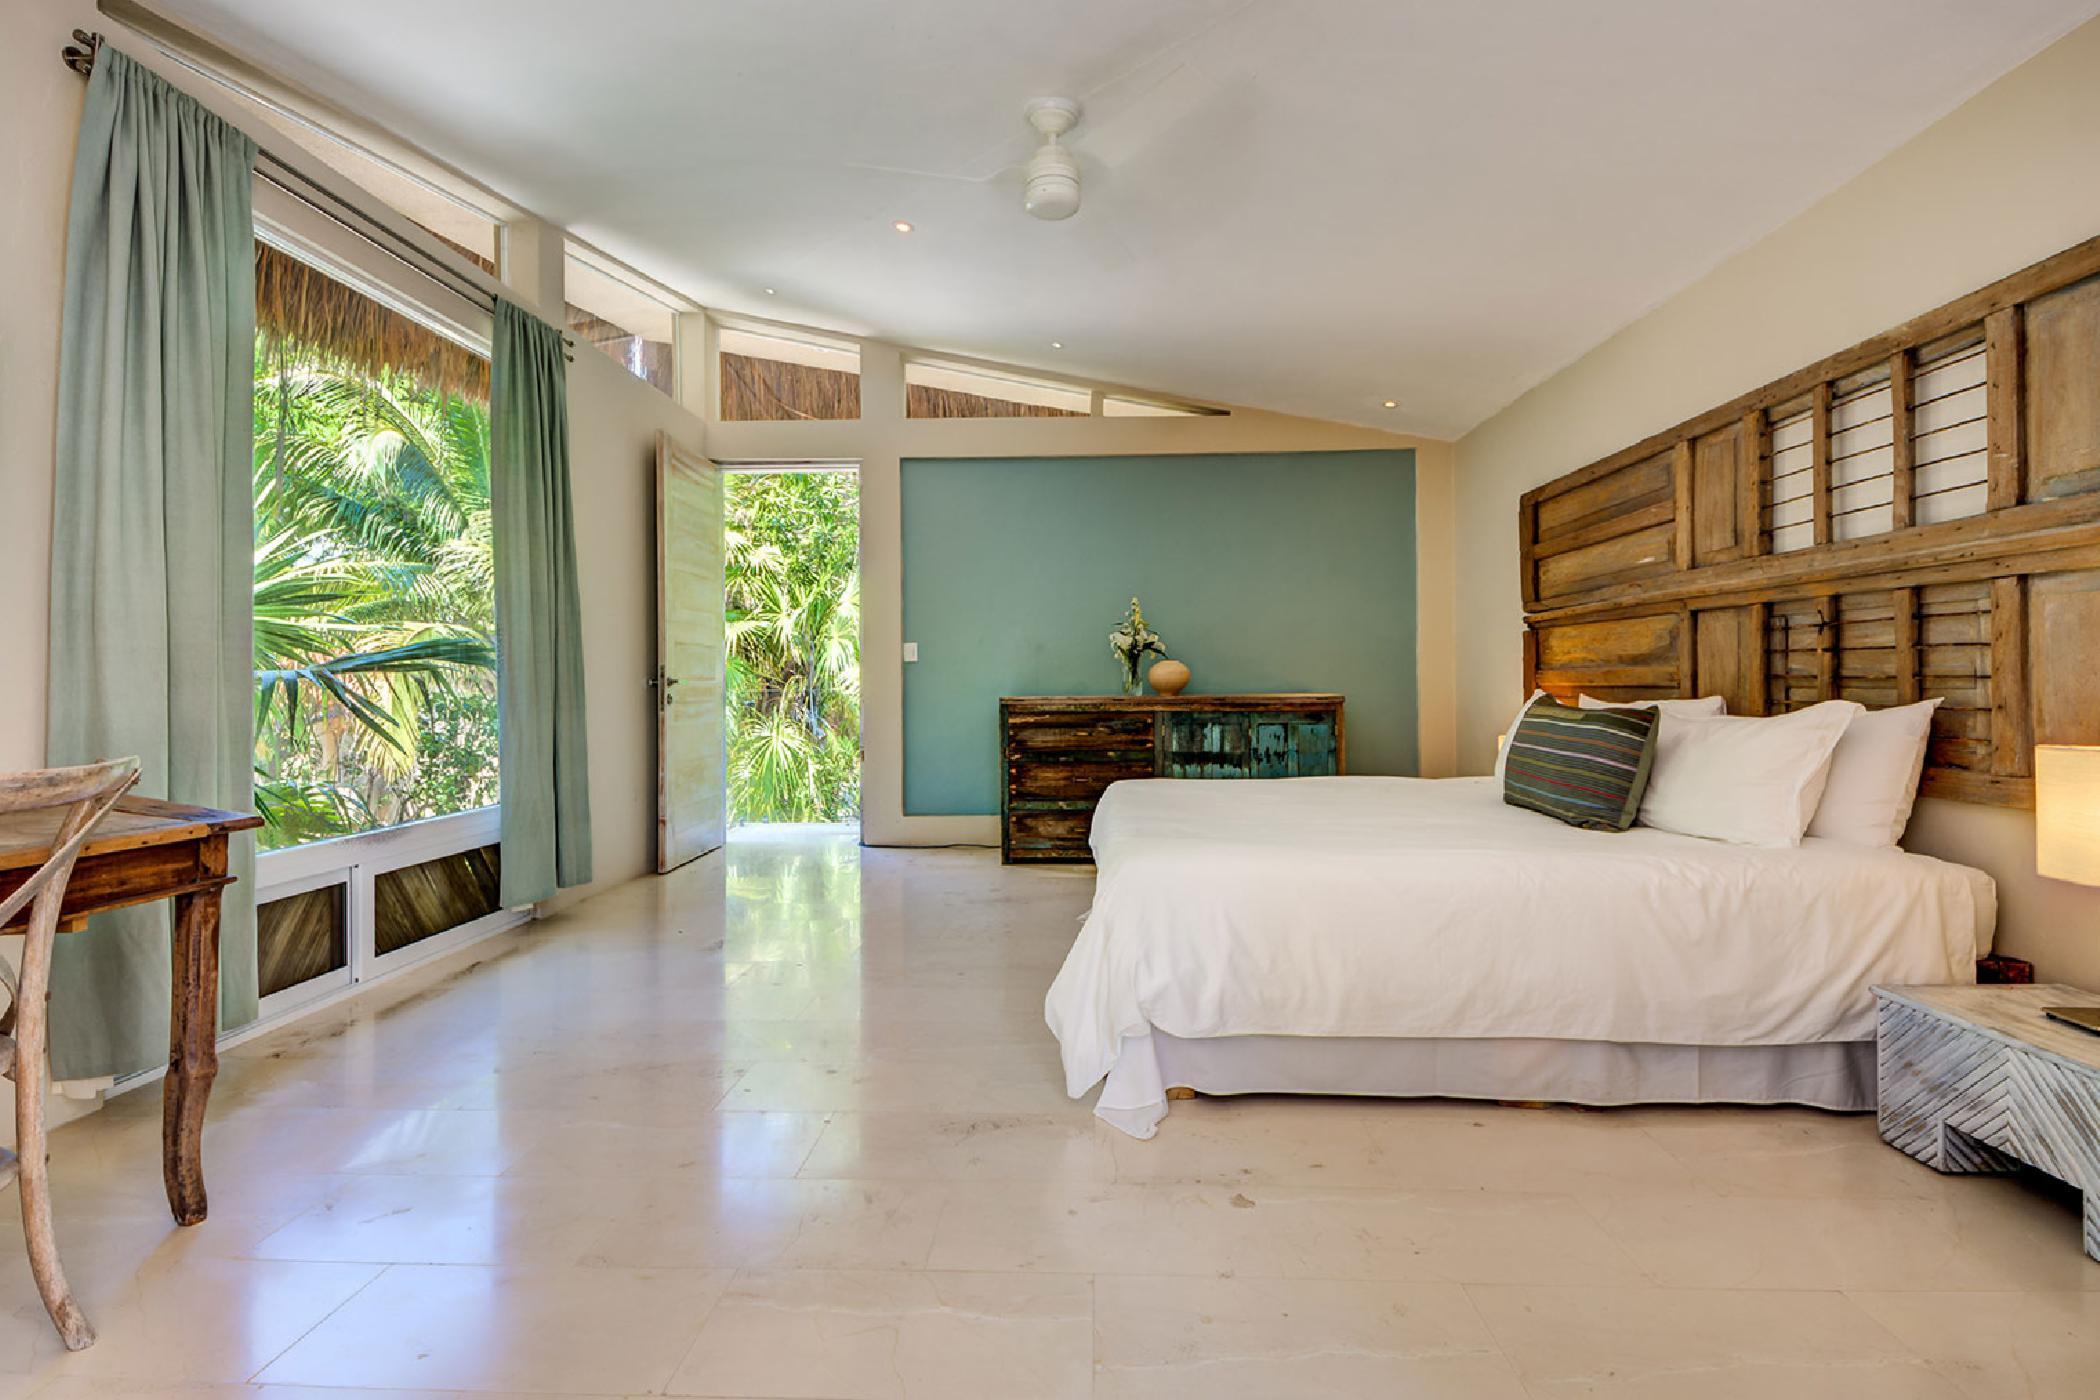 Maya_Luxe_Riviera_Maya_Luxury_Villas_Experiences_Puerto_Aventuras_5_Bedrooms_Zacil_Na_18.jpg